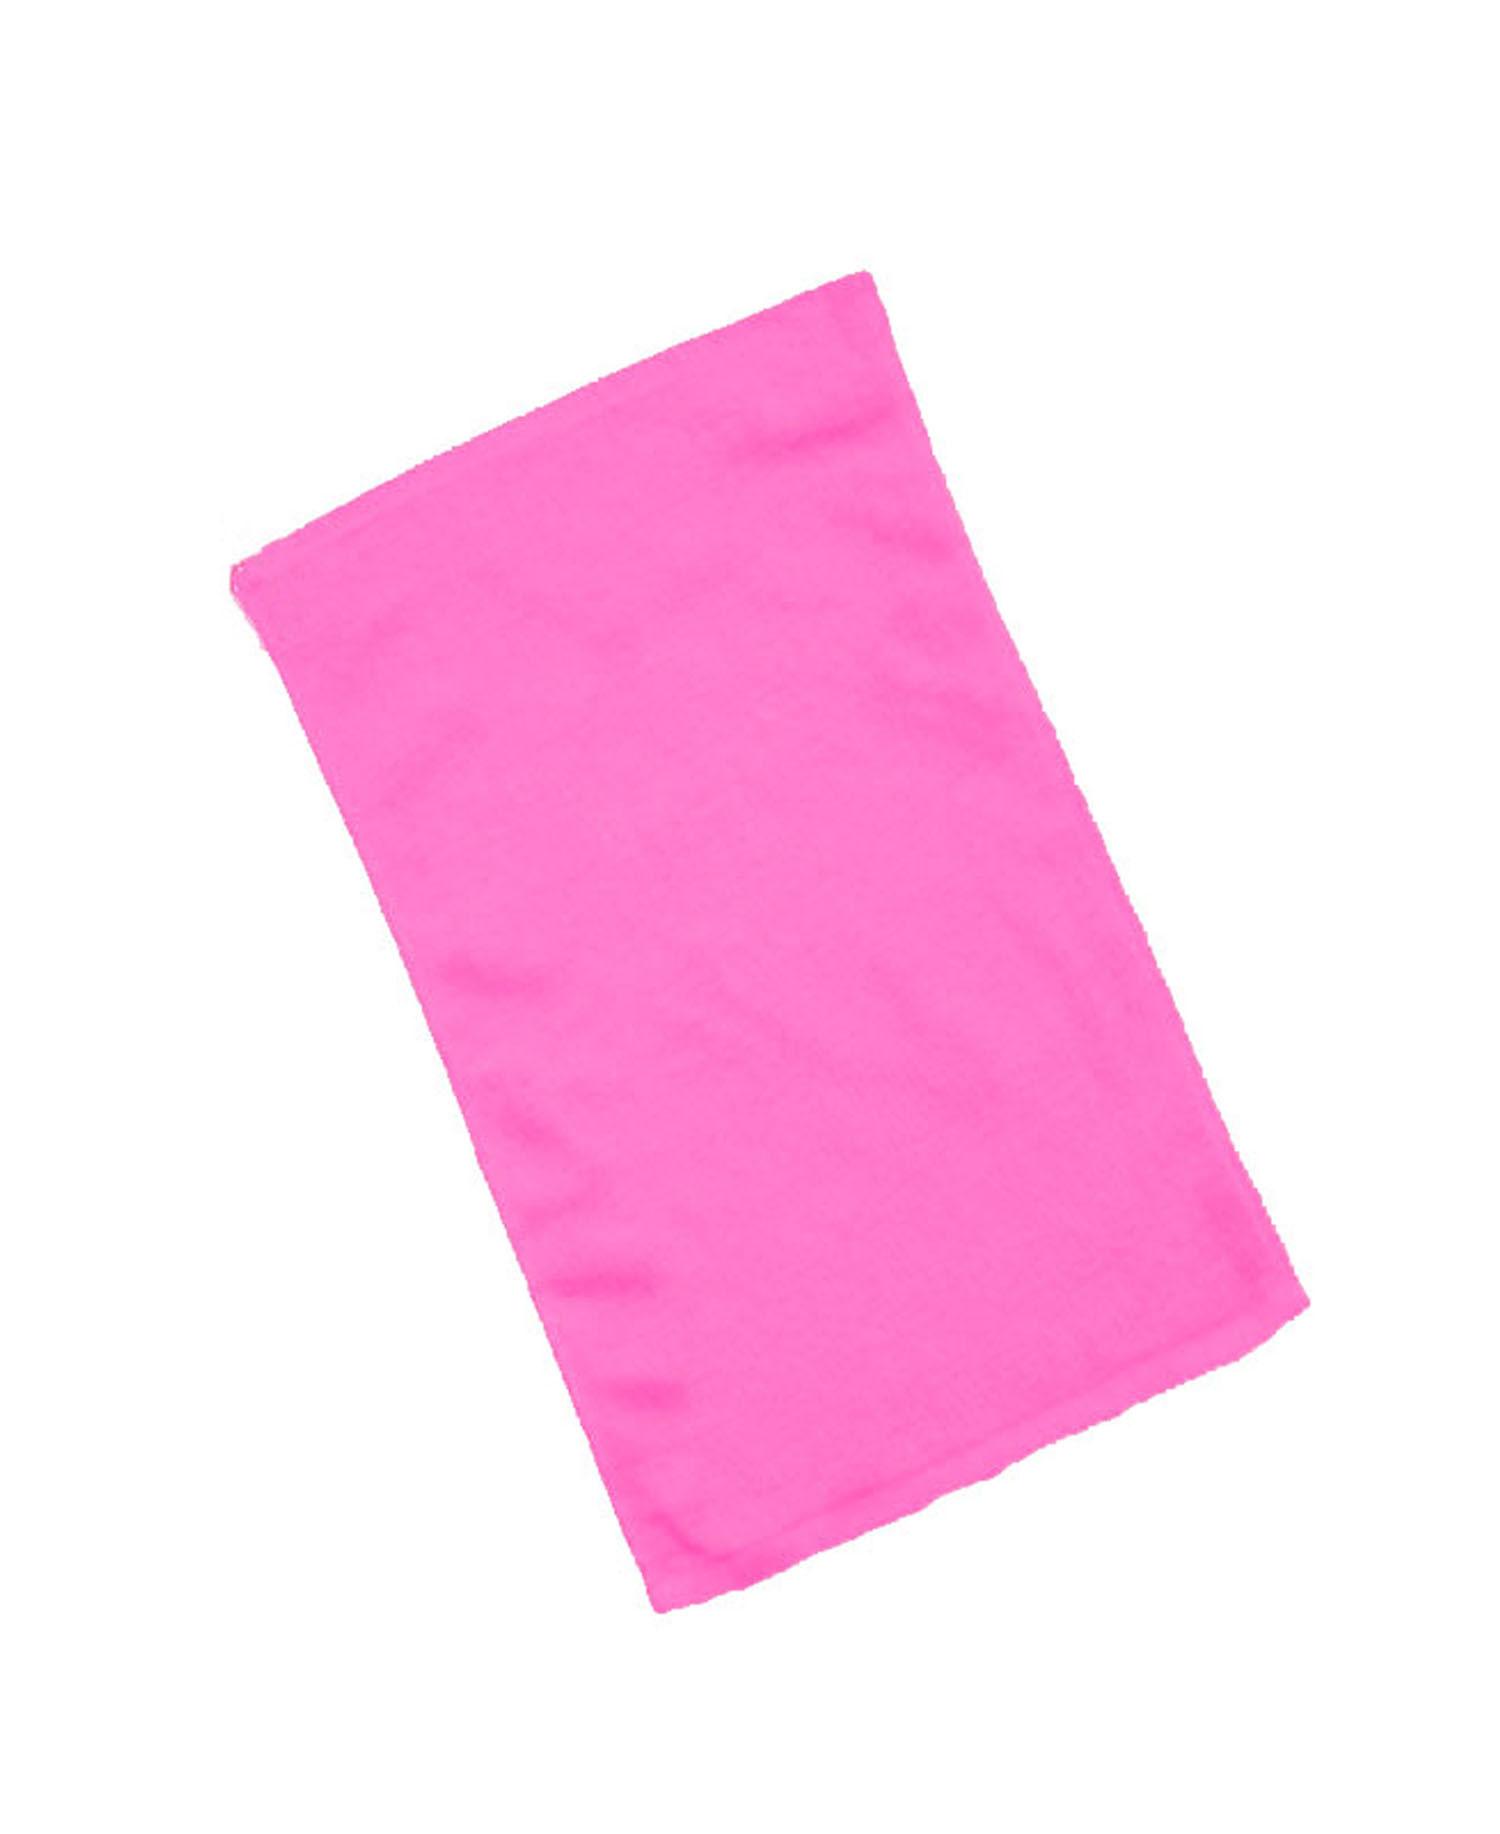 Q-Tees of California - Q0T600 Fingertip Towel Hemmed